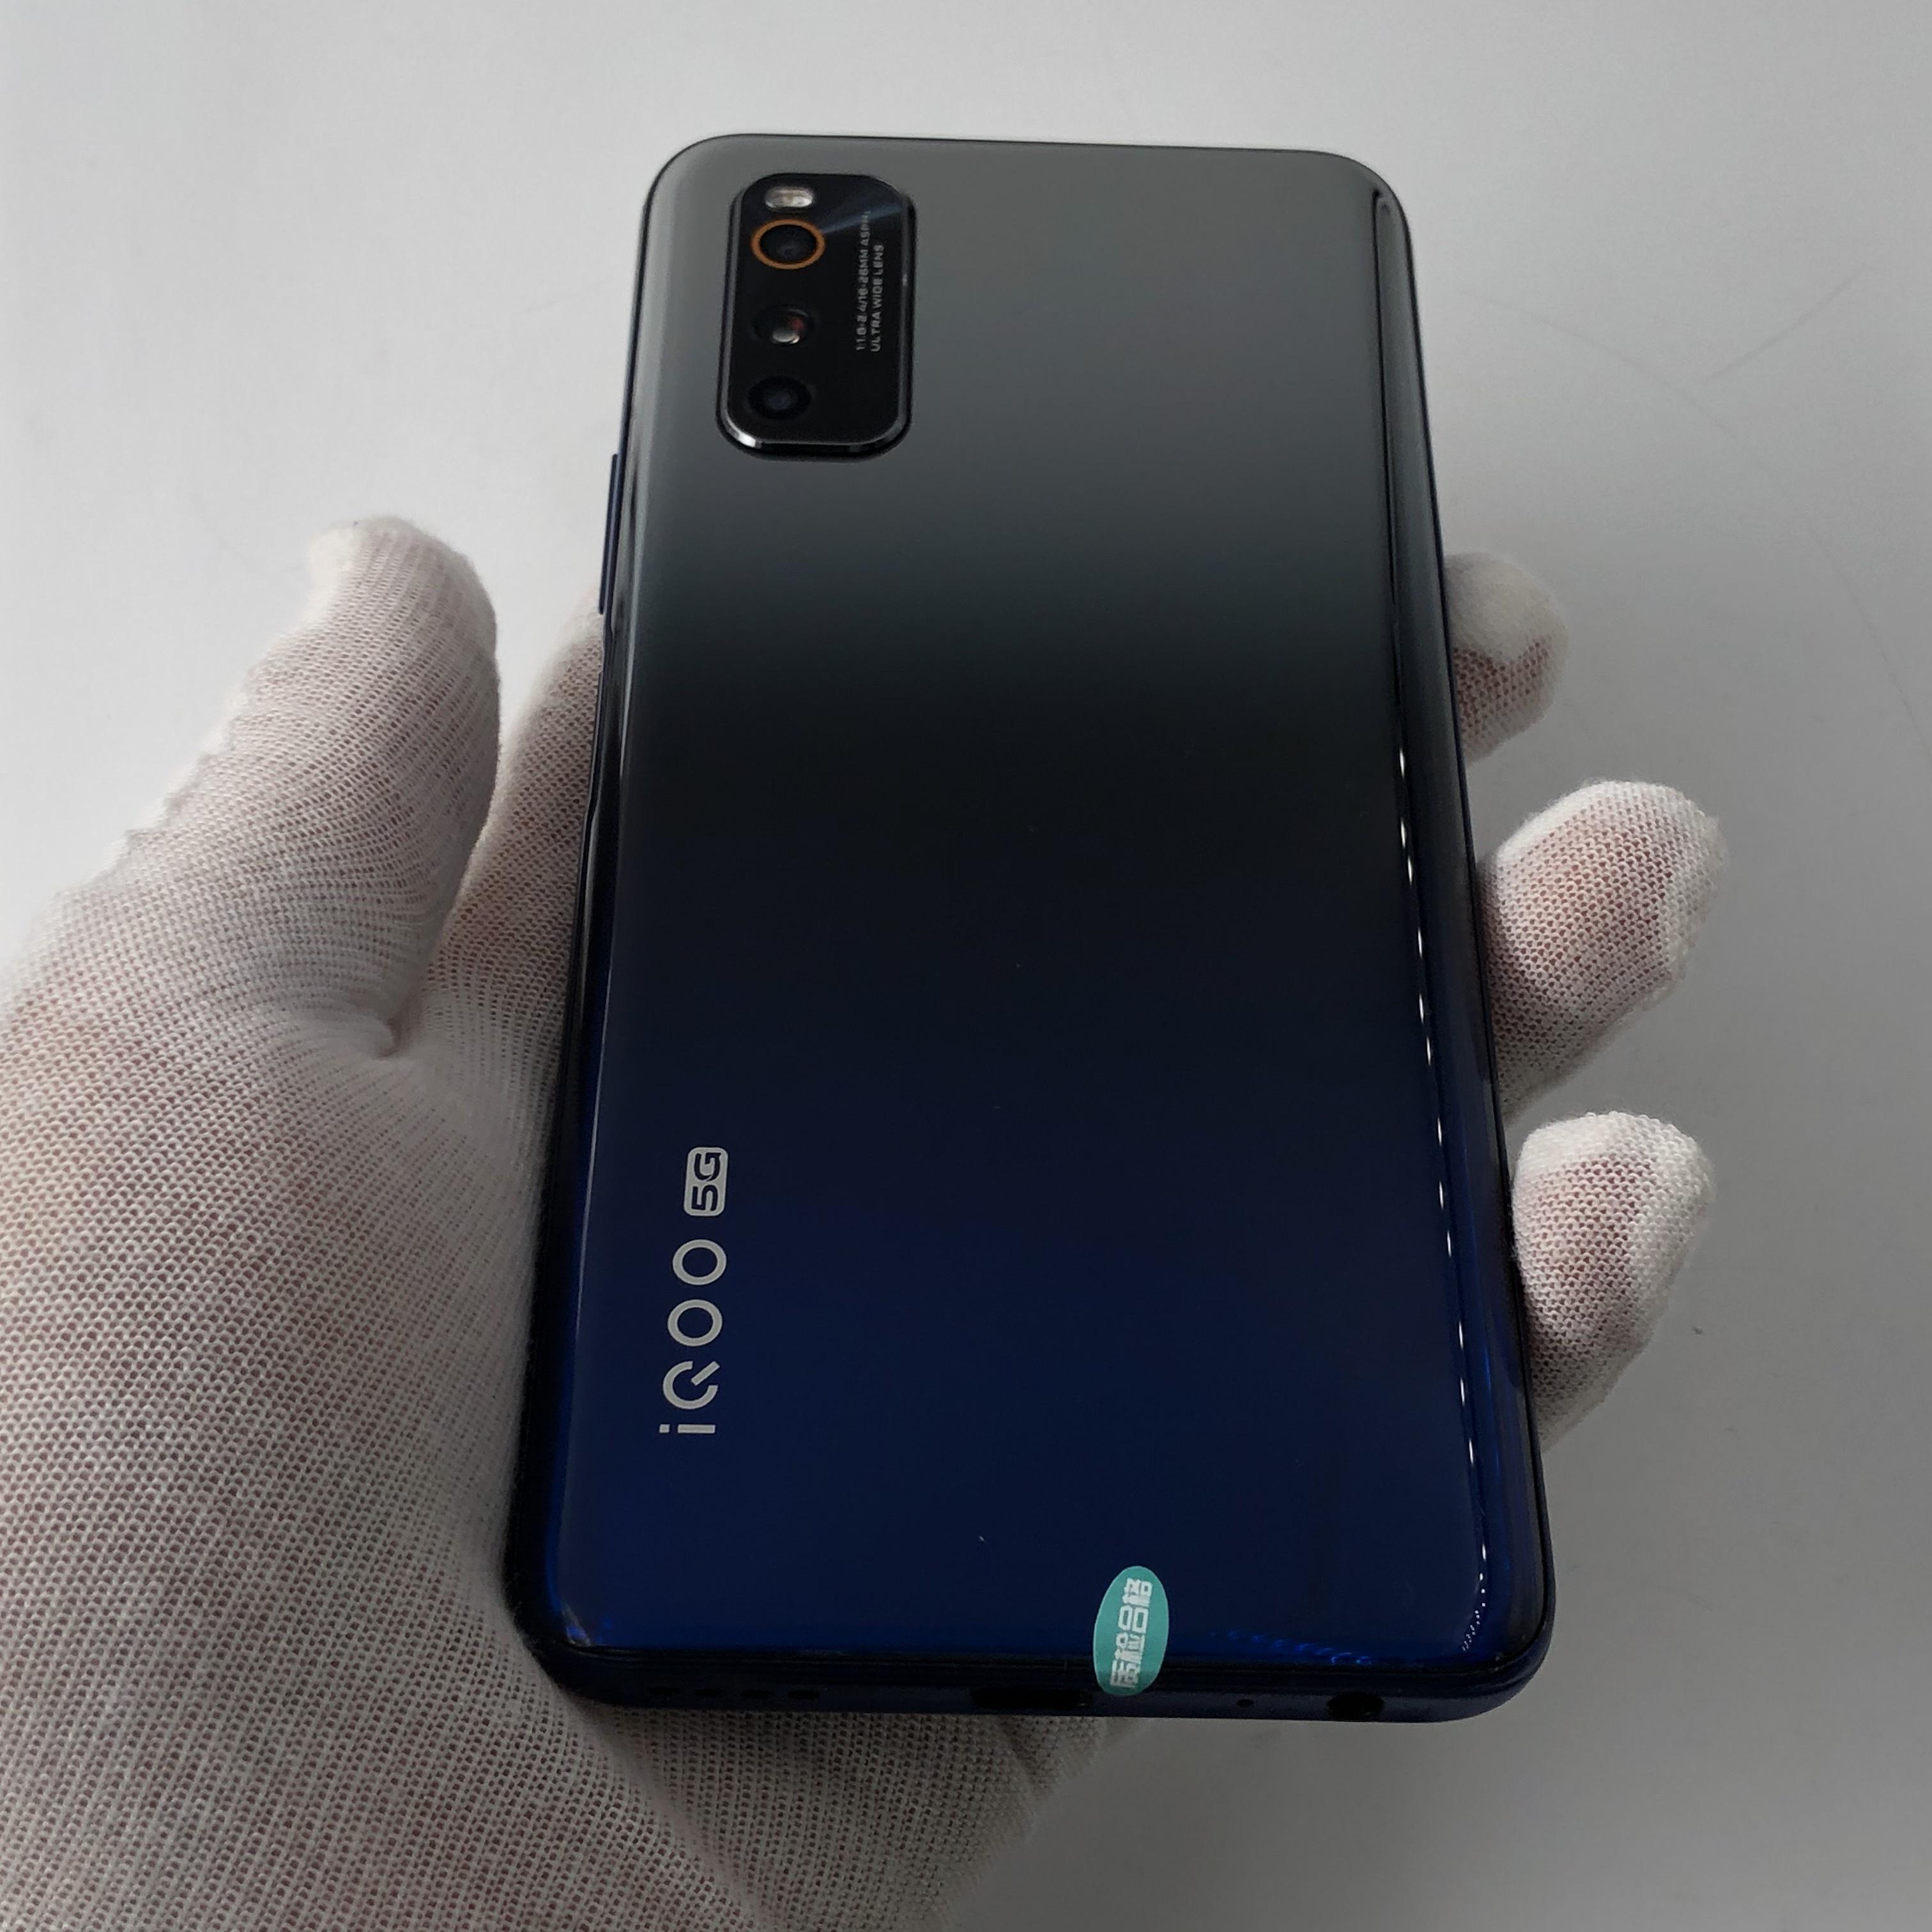 vivo【iQOO Neo3 5G】5G全网通 夜幕黑 6G/128G 国行 8成新